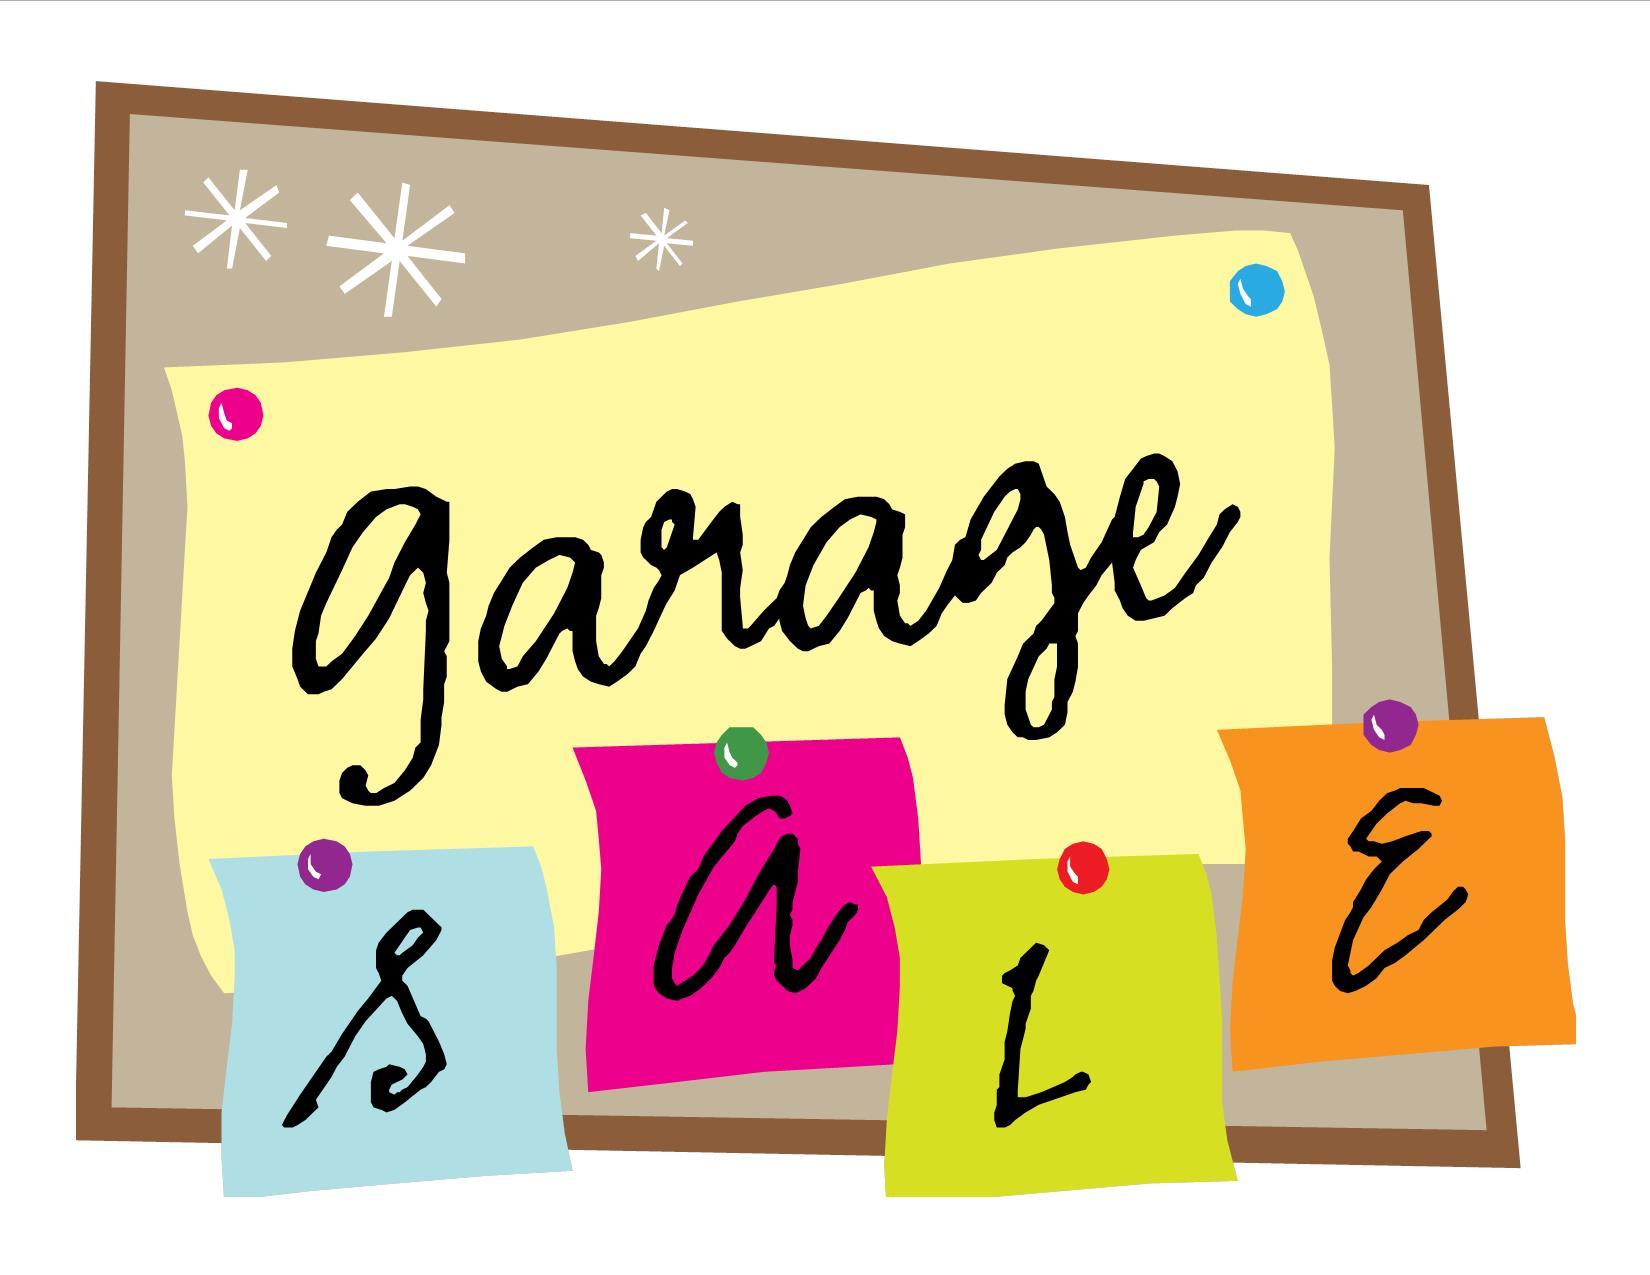 1650x1275 Clipart Garage Sale Signs